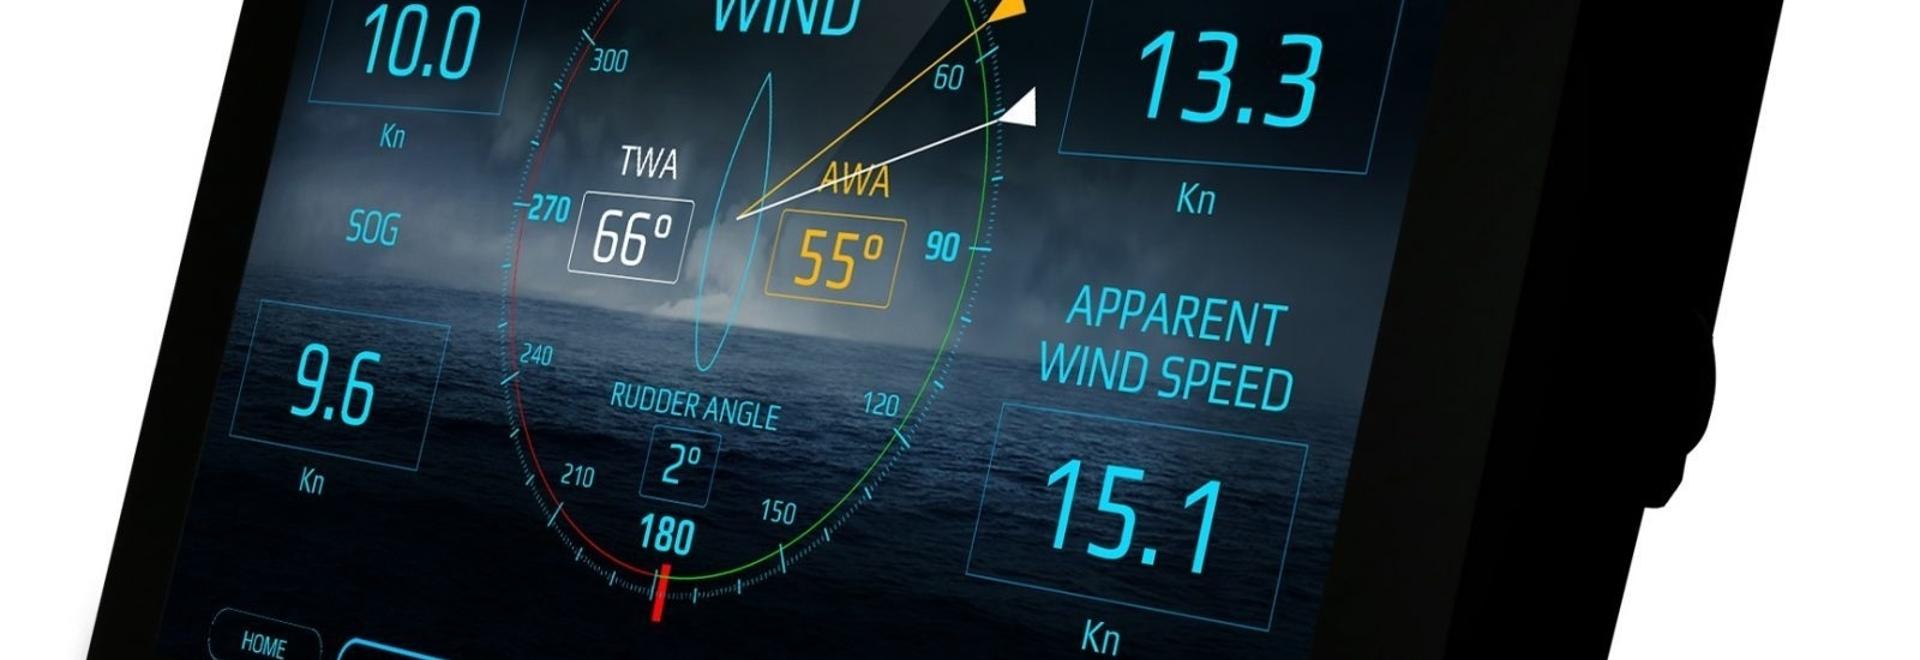 Oceanic Systems lanza Poseidon 7, la primera ampliación de la gama de sistemas Poseidon